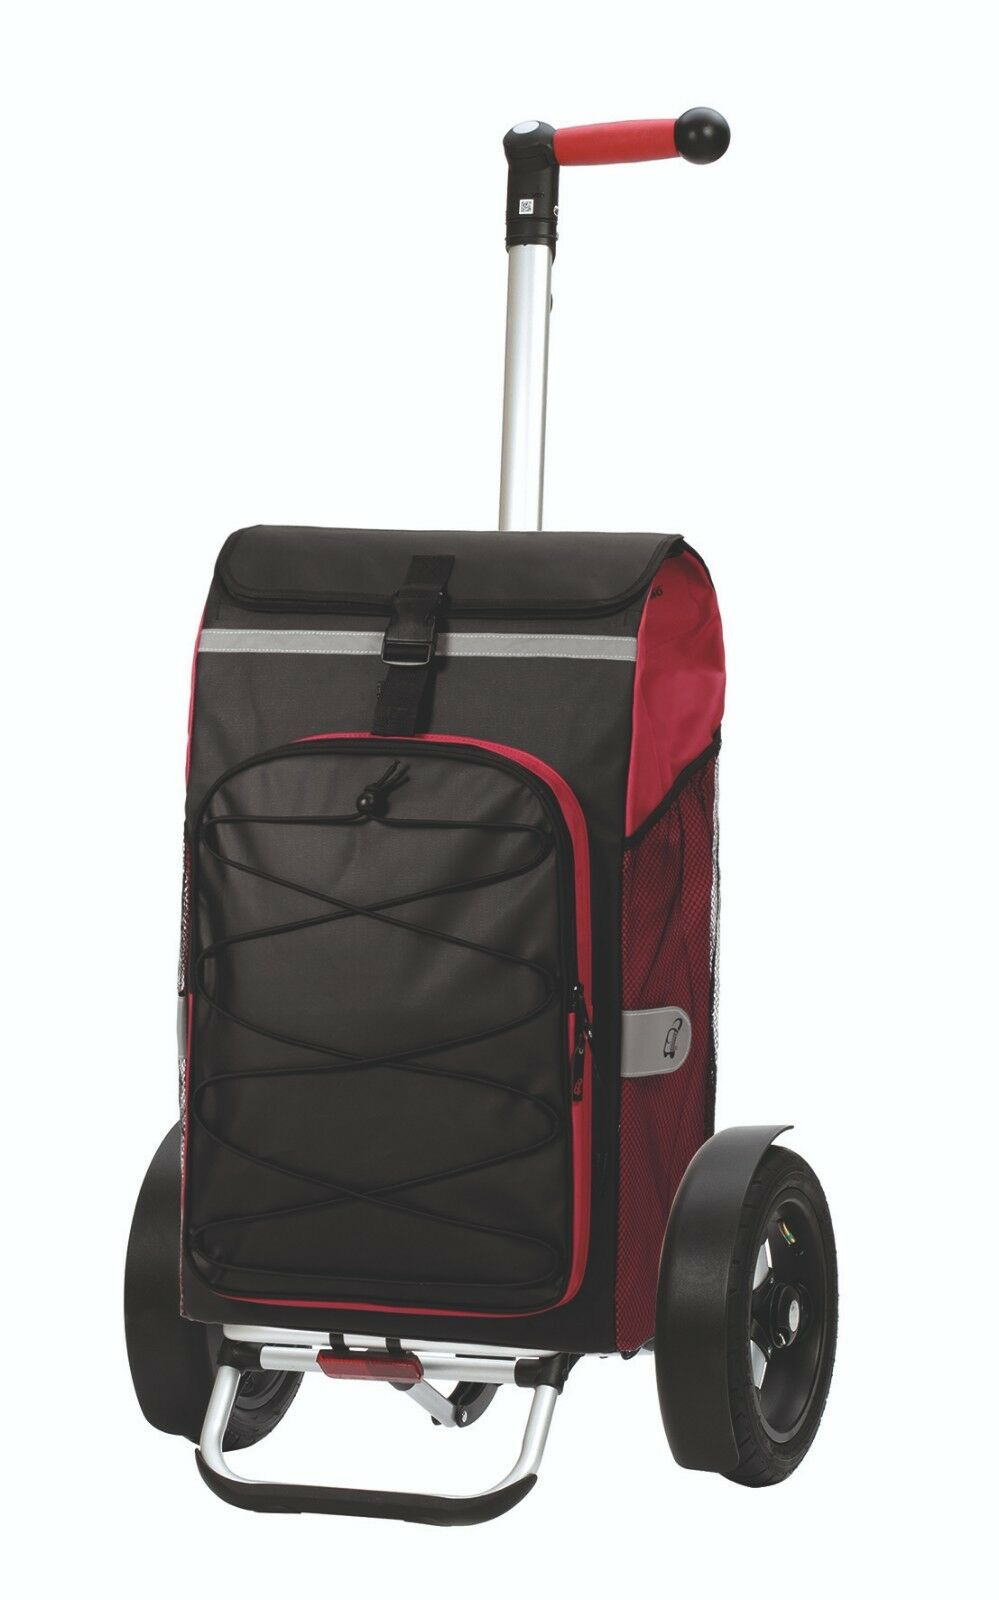 Andersen Tura Shopper Fado Einkaufstrolley Luft- Kugellagerrad Einkaufswagen Einkaufstrolley Fado c6d8e5